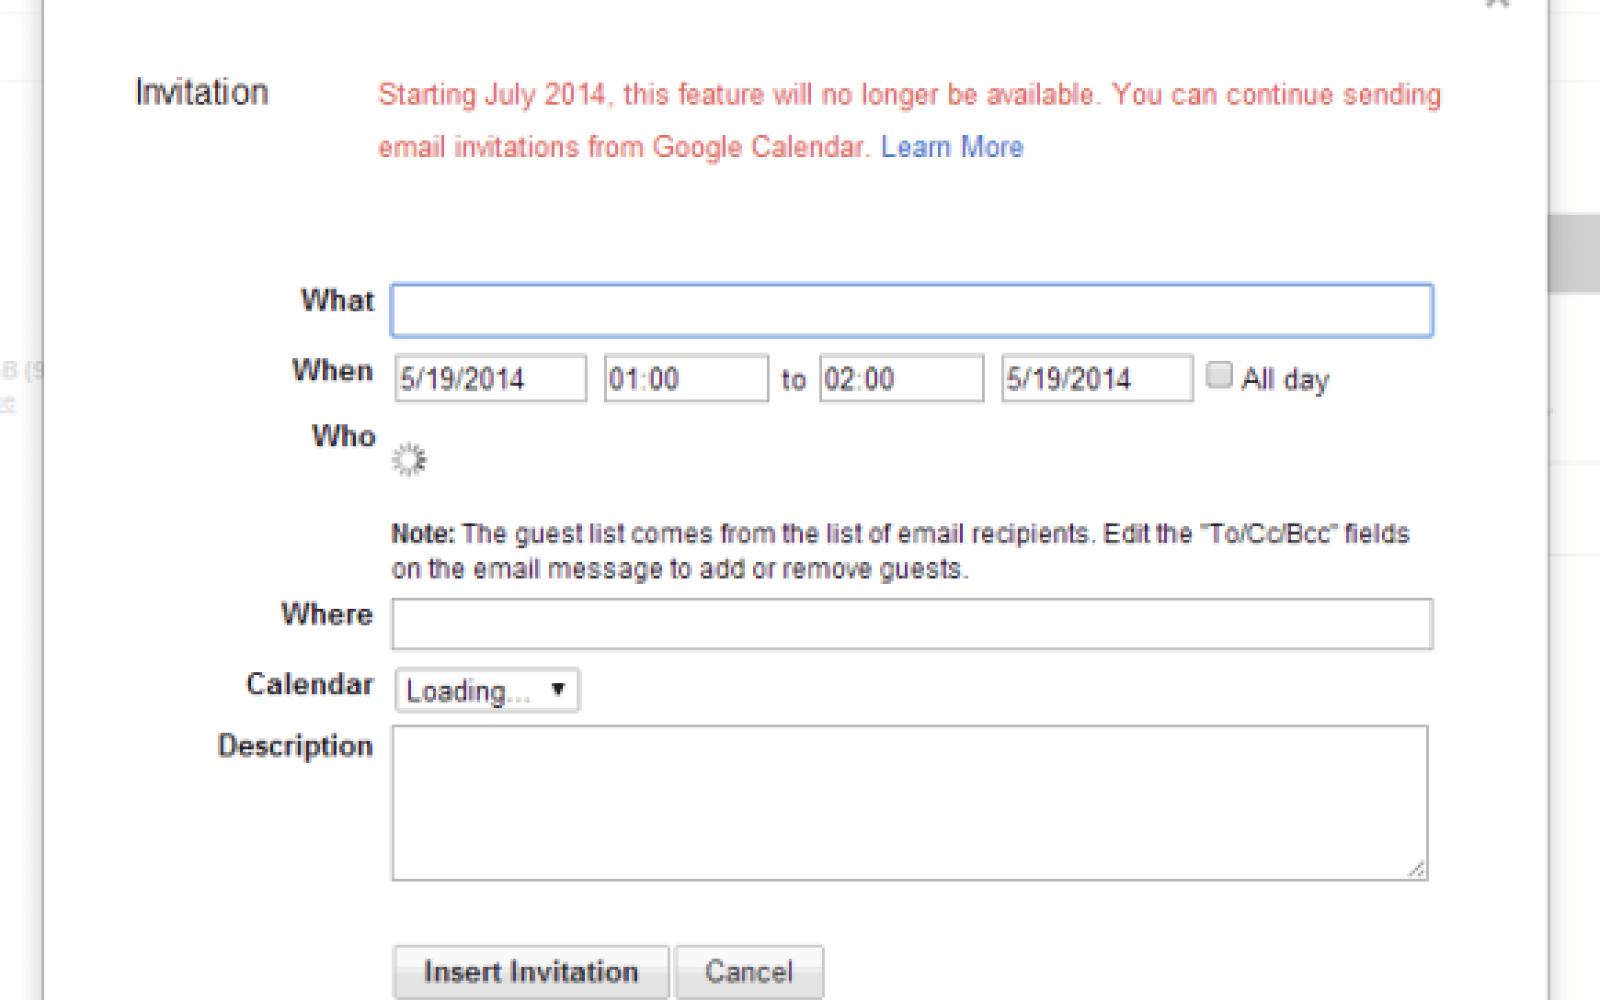 Google retiring Gmail Calendar invitation feature in July